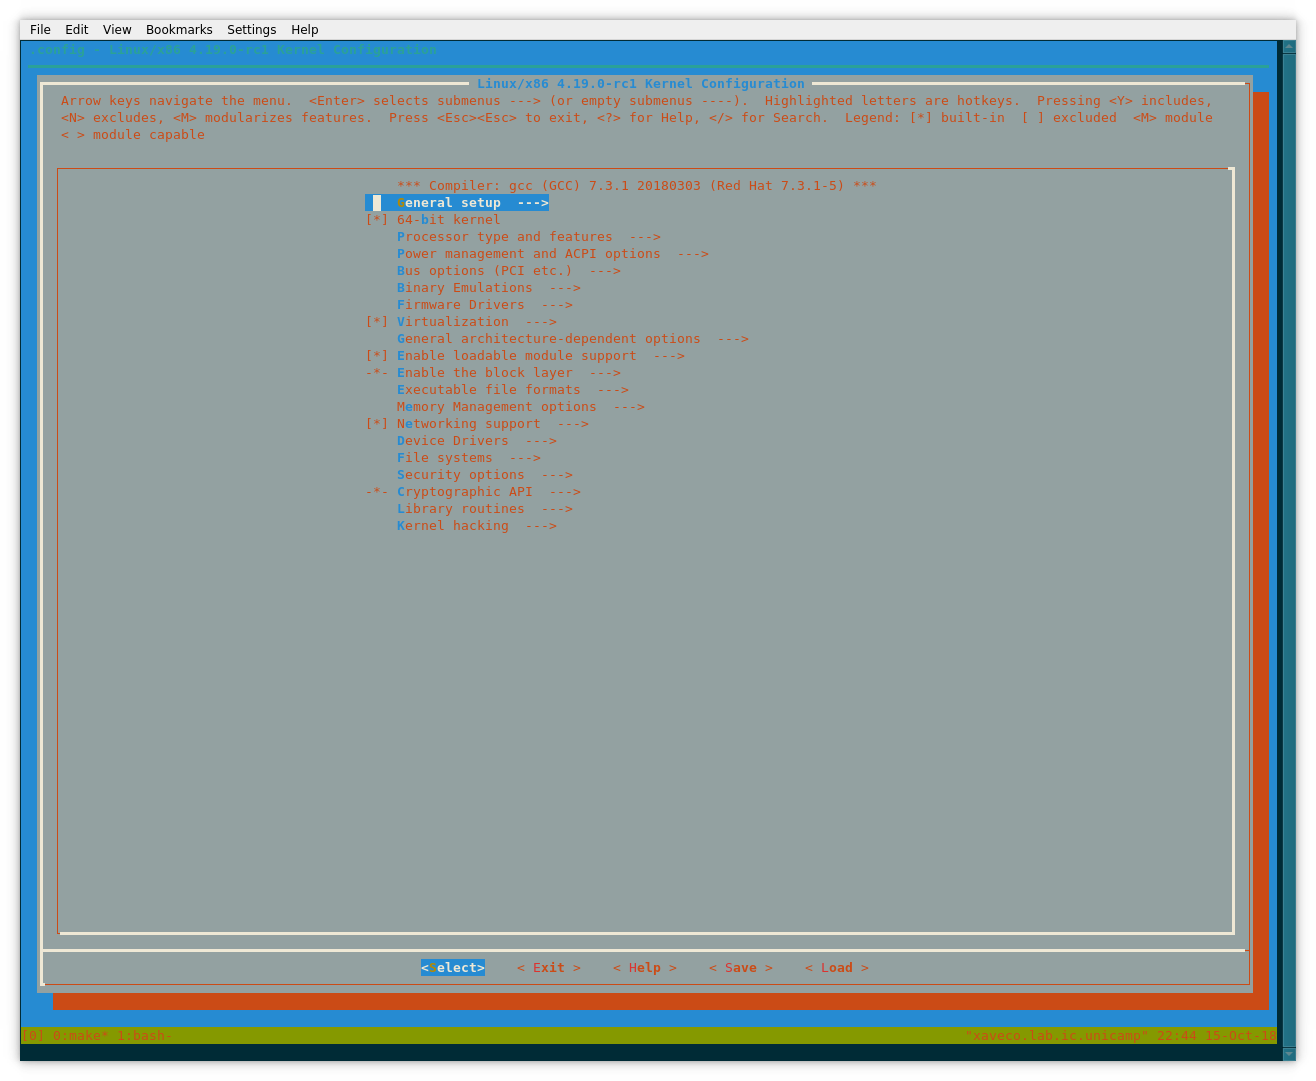 Booting - LKCamp Documentation